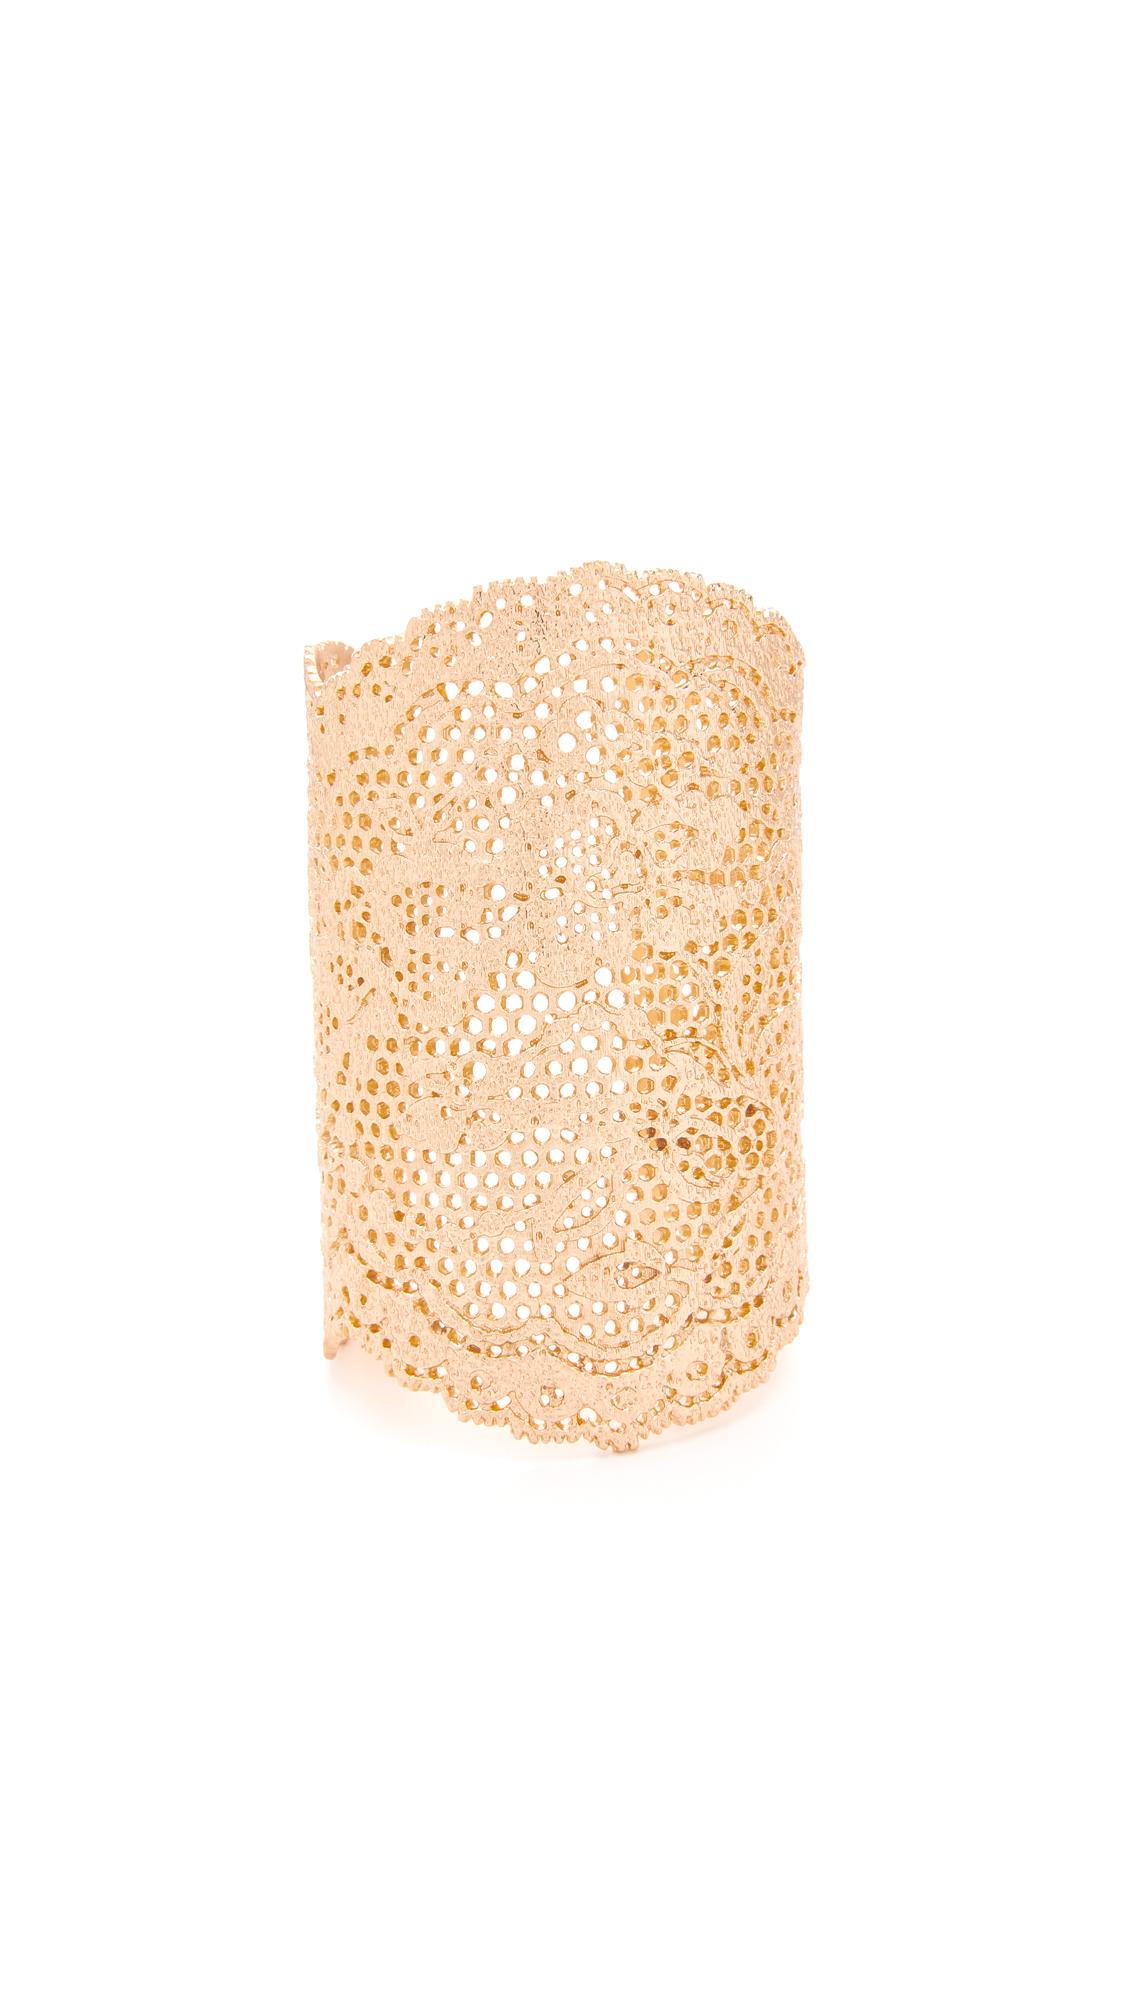 Aurelie Bidermann Lace Cuff - Rose Gold at Shopbop